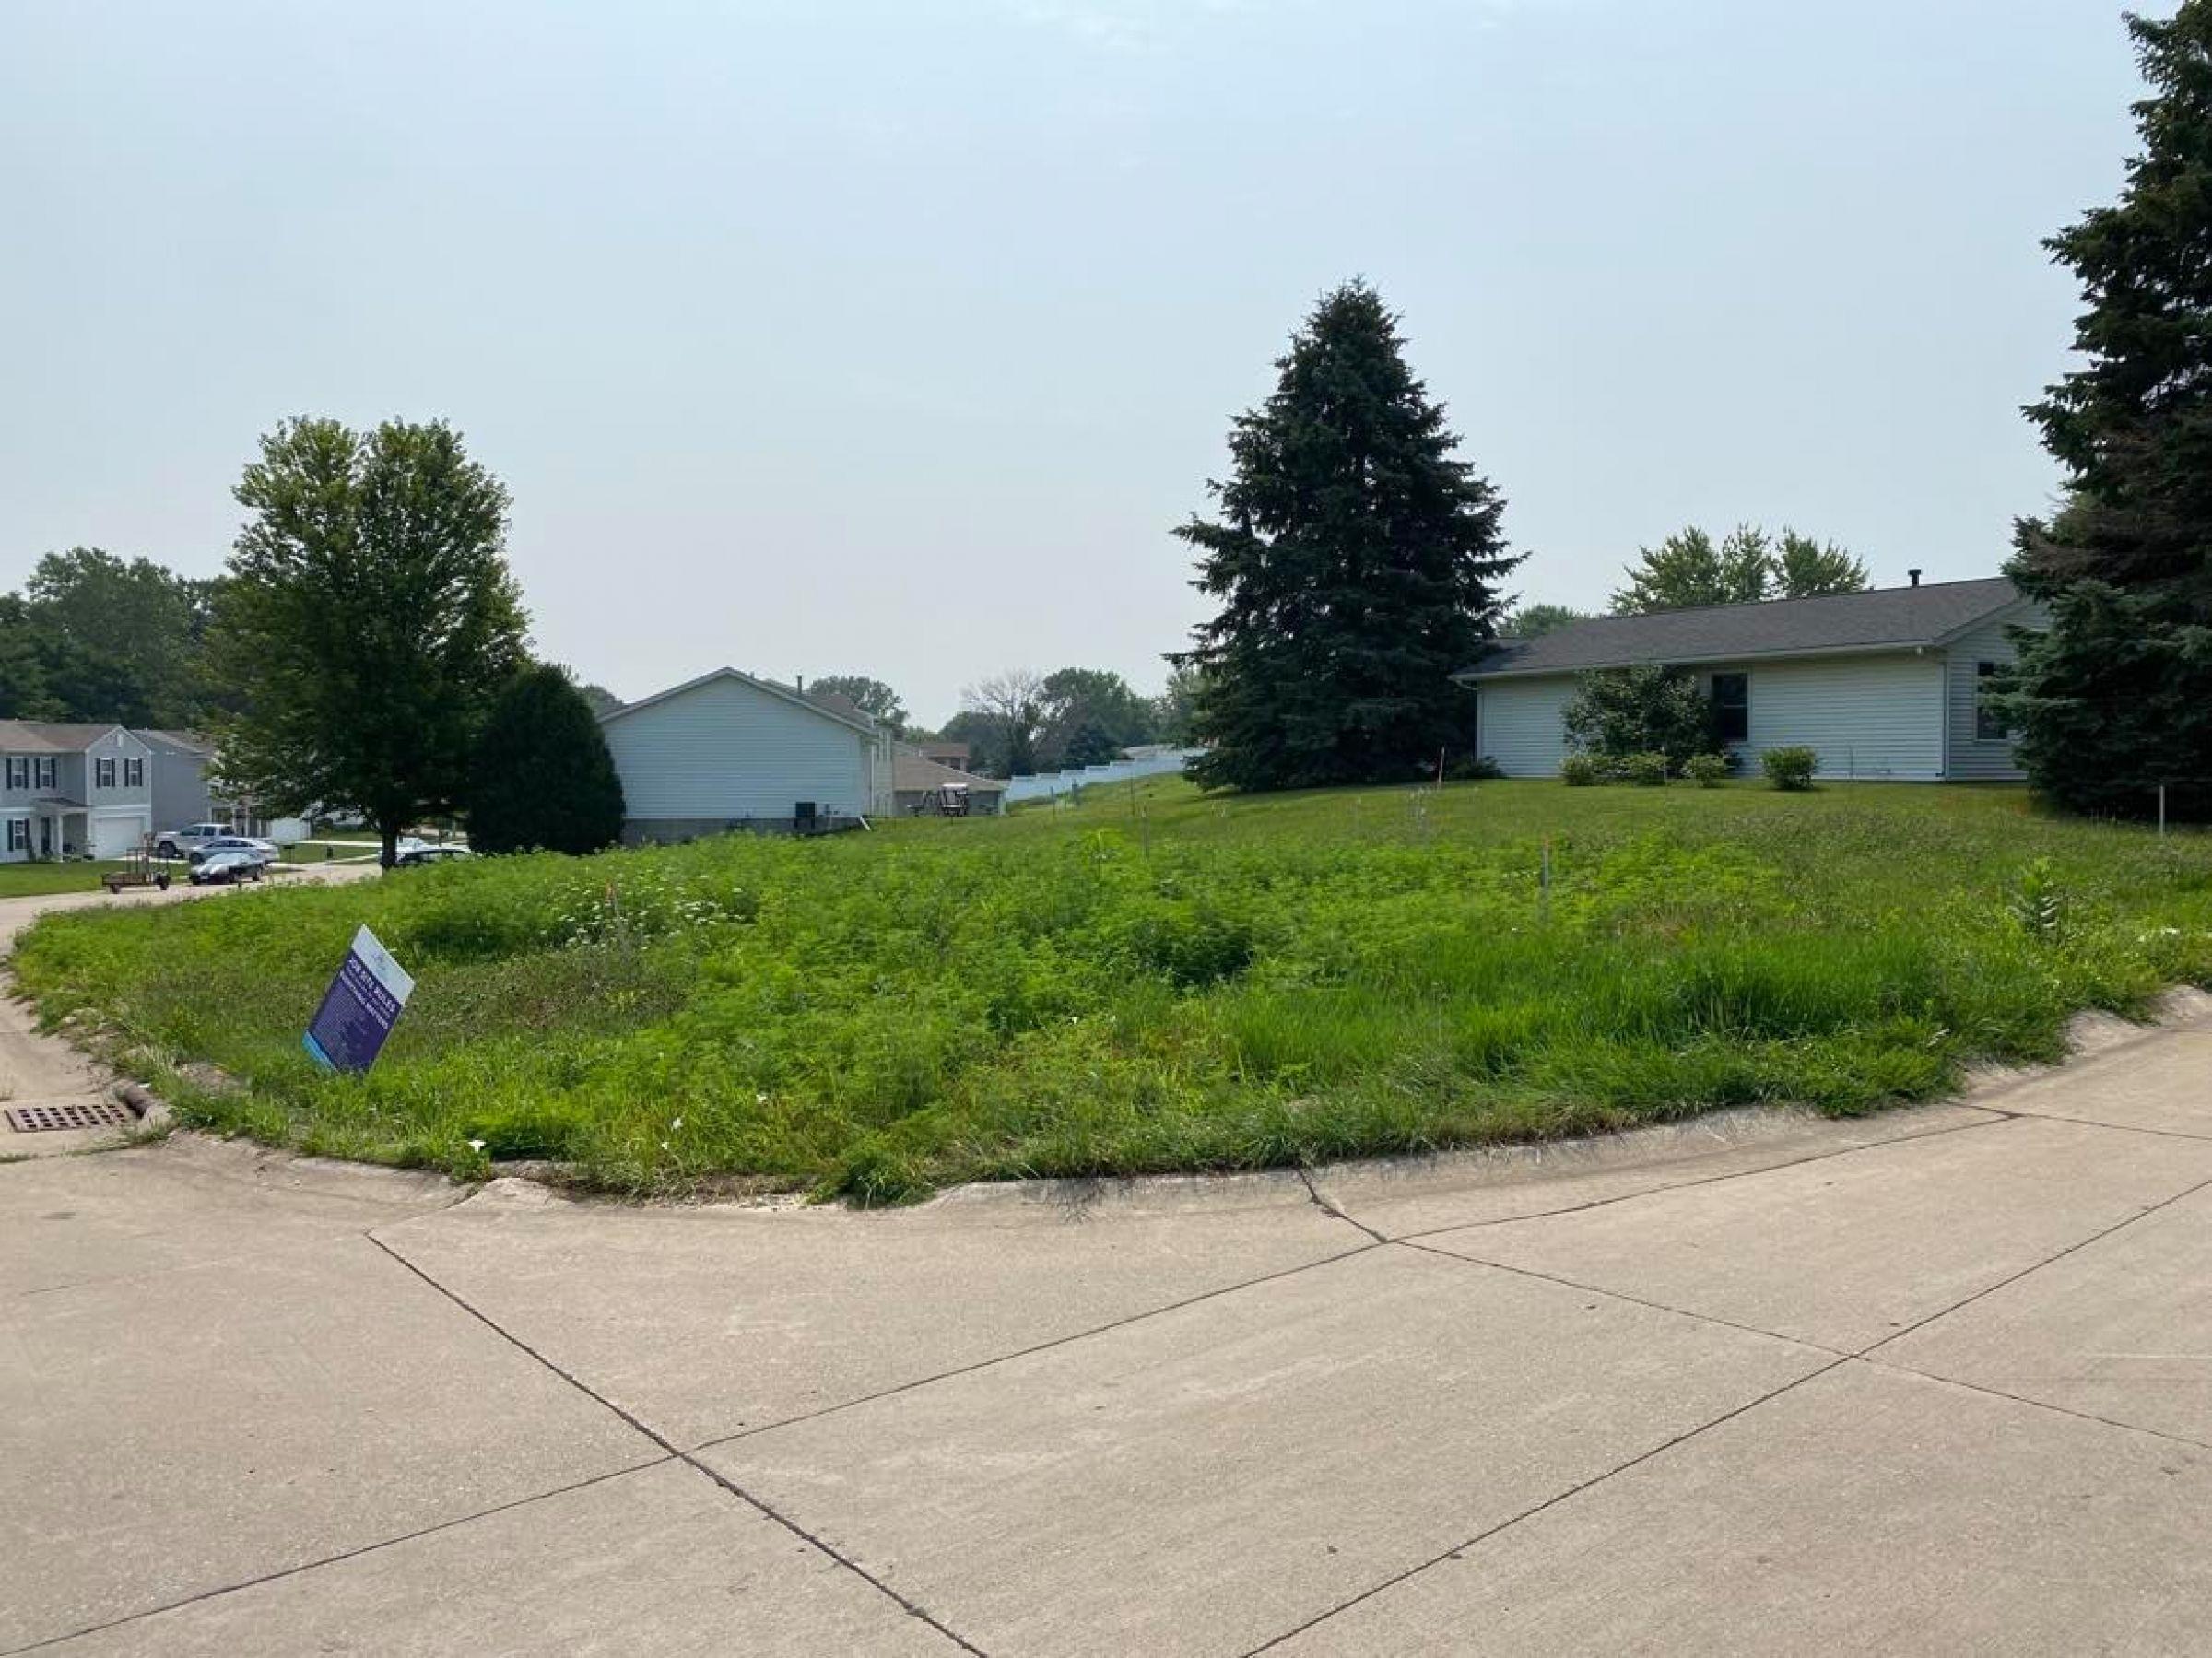 development-land-scott-county-iowa-0-acres-listing-number-15767-7-2021-09-22-040117.jpg